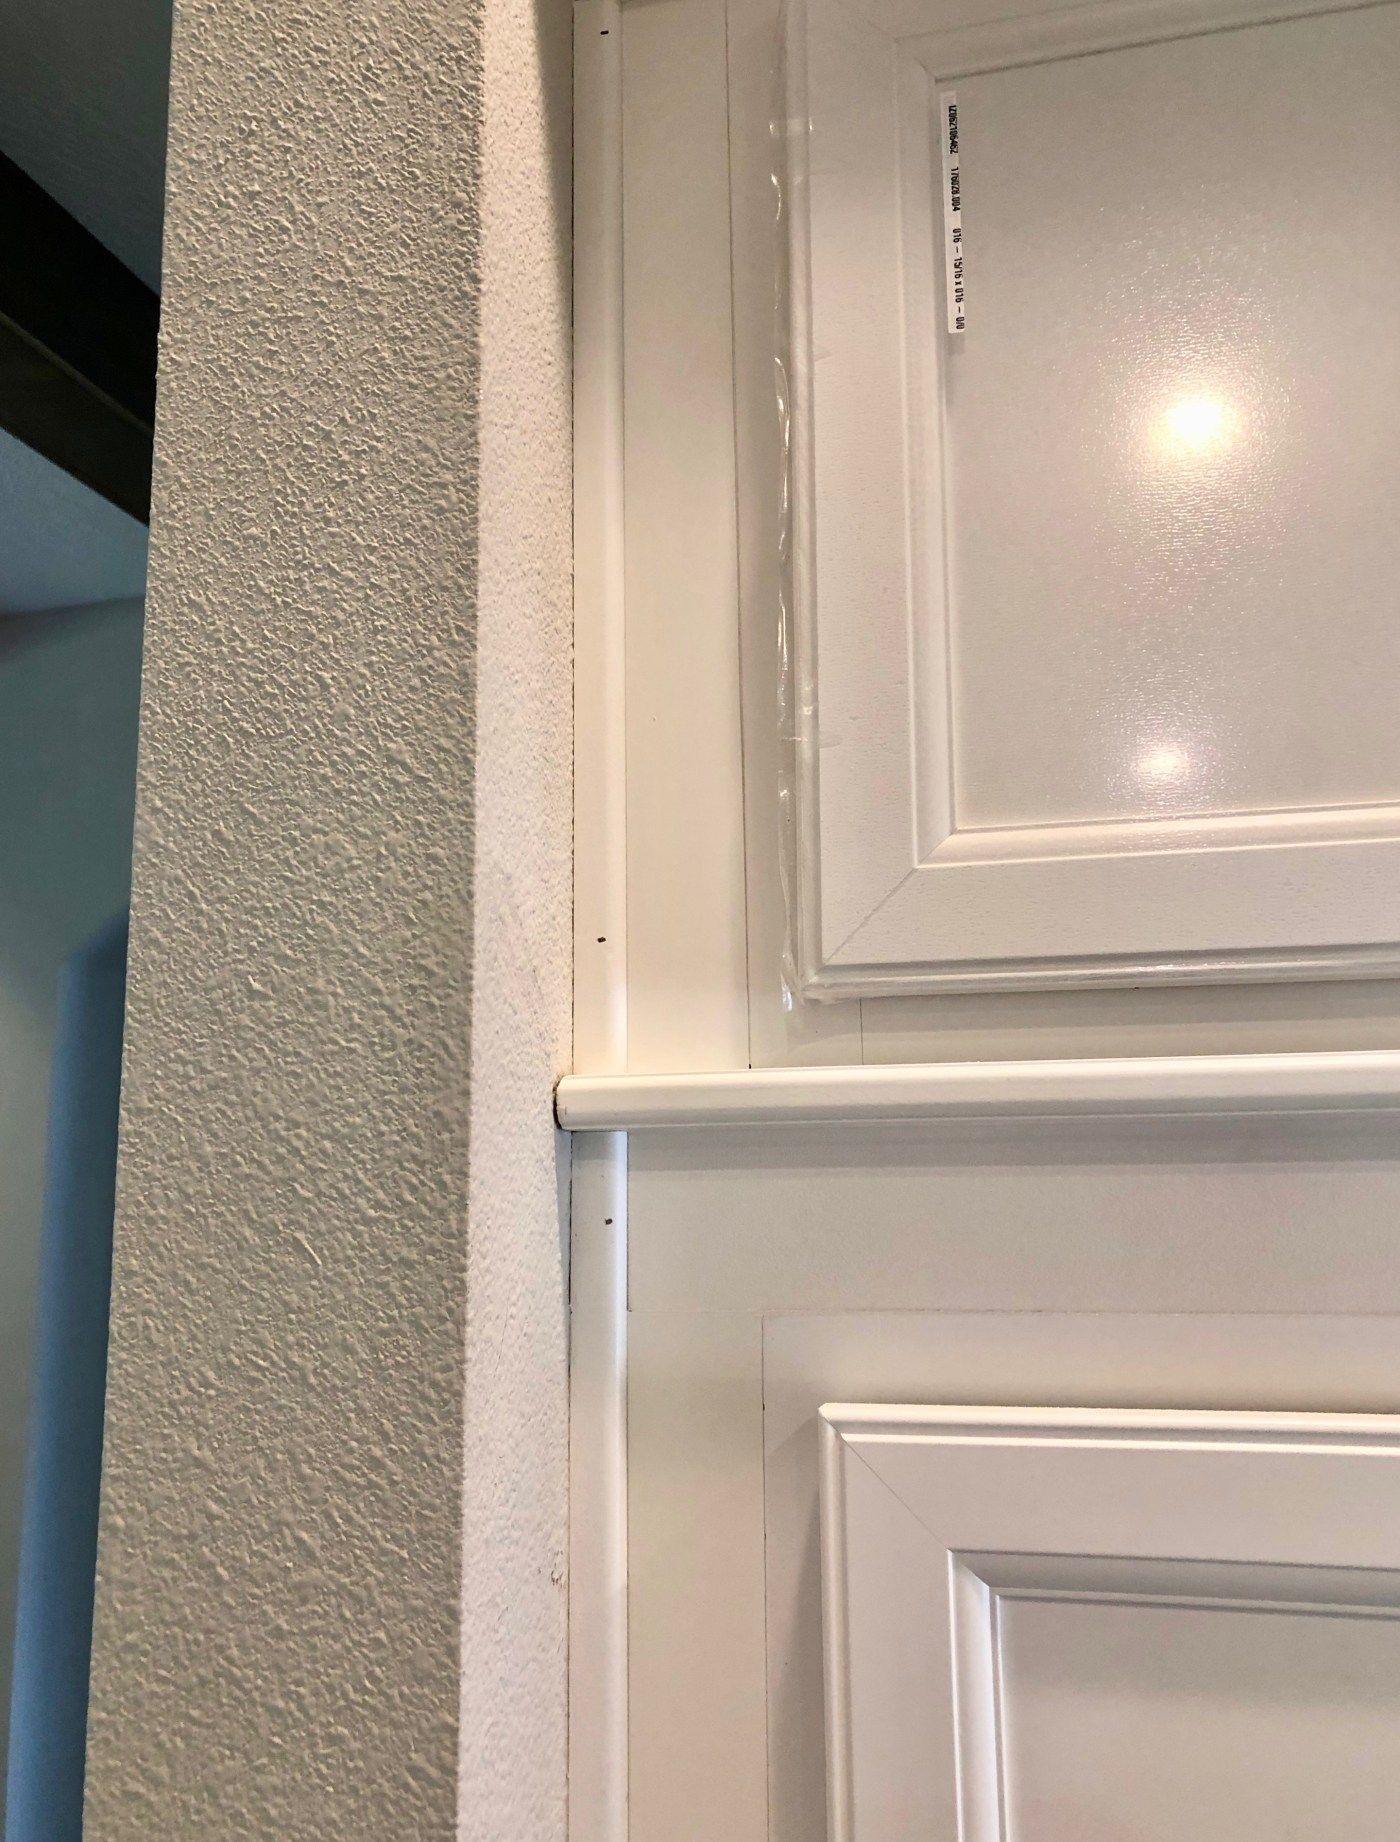 Diy Stacked Kitchen Cabinets Frills And Drills In 2020 Kitchen Cabinets Painted Kitchen Cabinets Colors Kitchen Inspiration Design